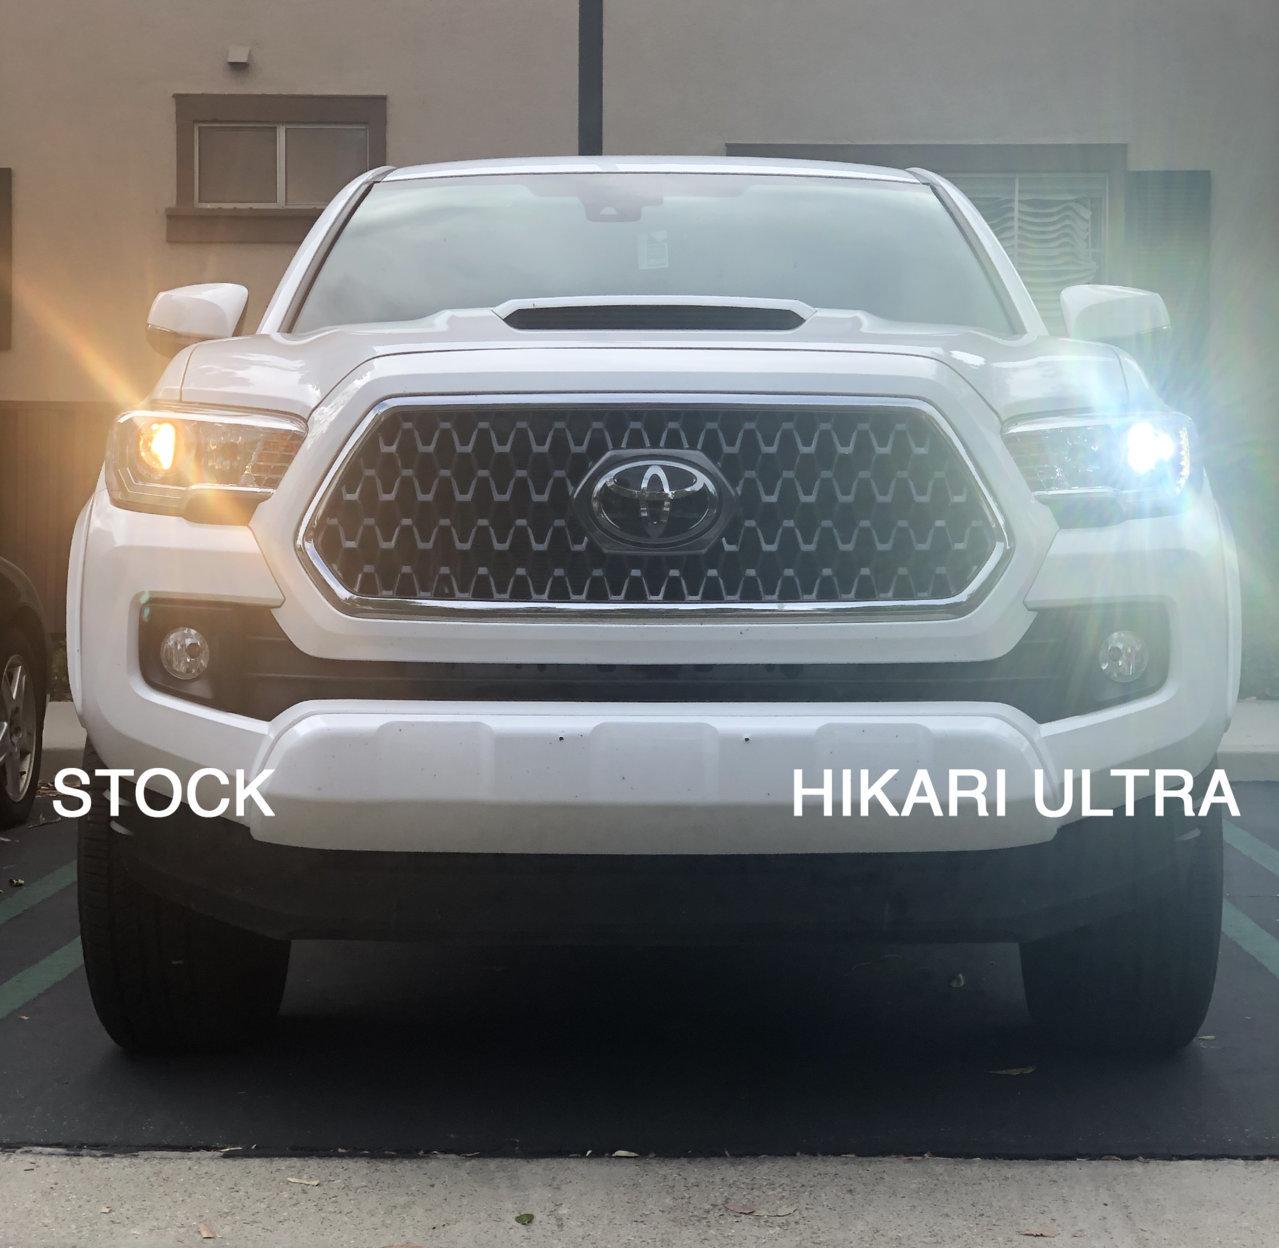 stock hikari.jpg